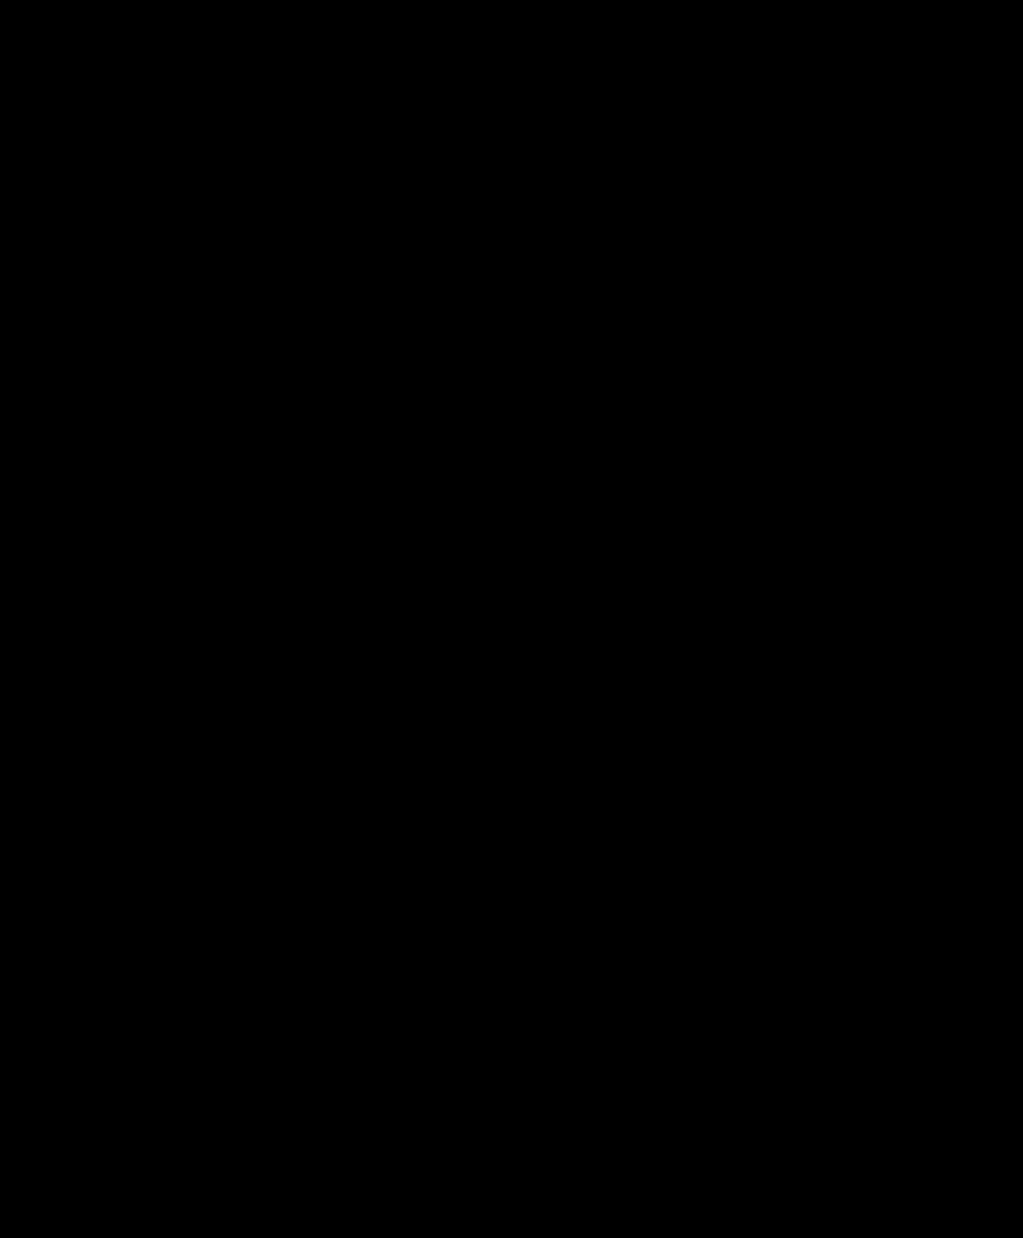 Logo von Ultimate Fitness, by FEFLOGX Sportswear, Workouts für jede Stufe.